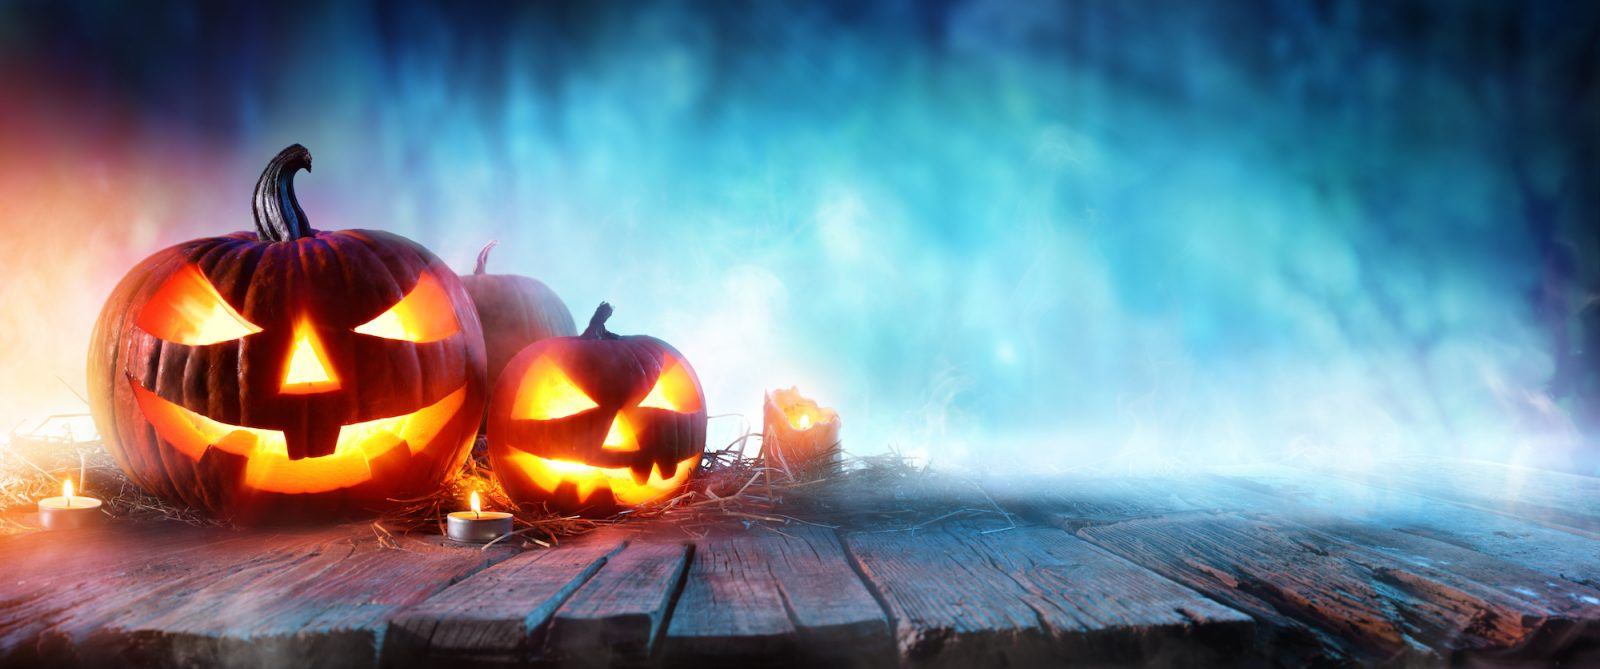 rituales noche de halloween